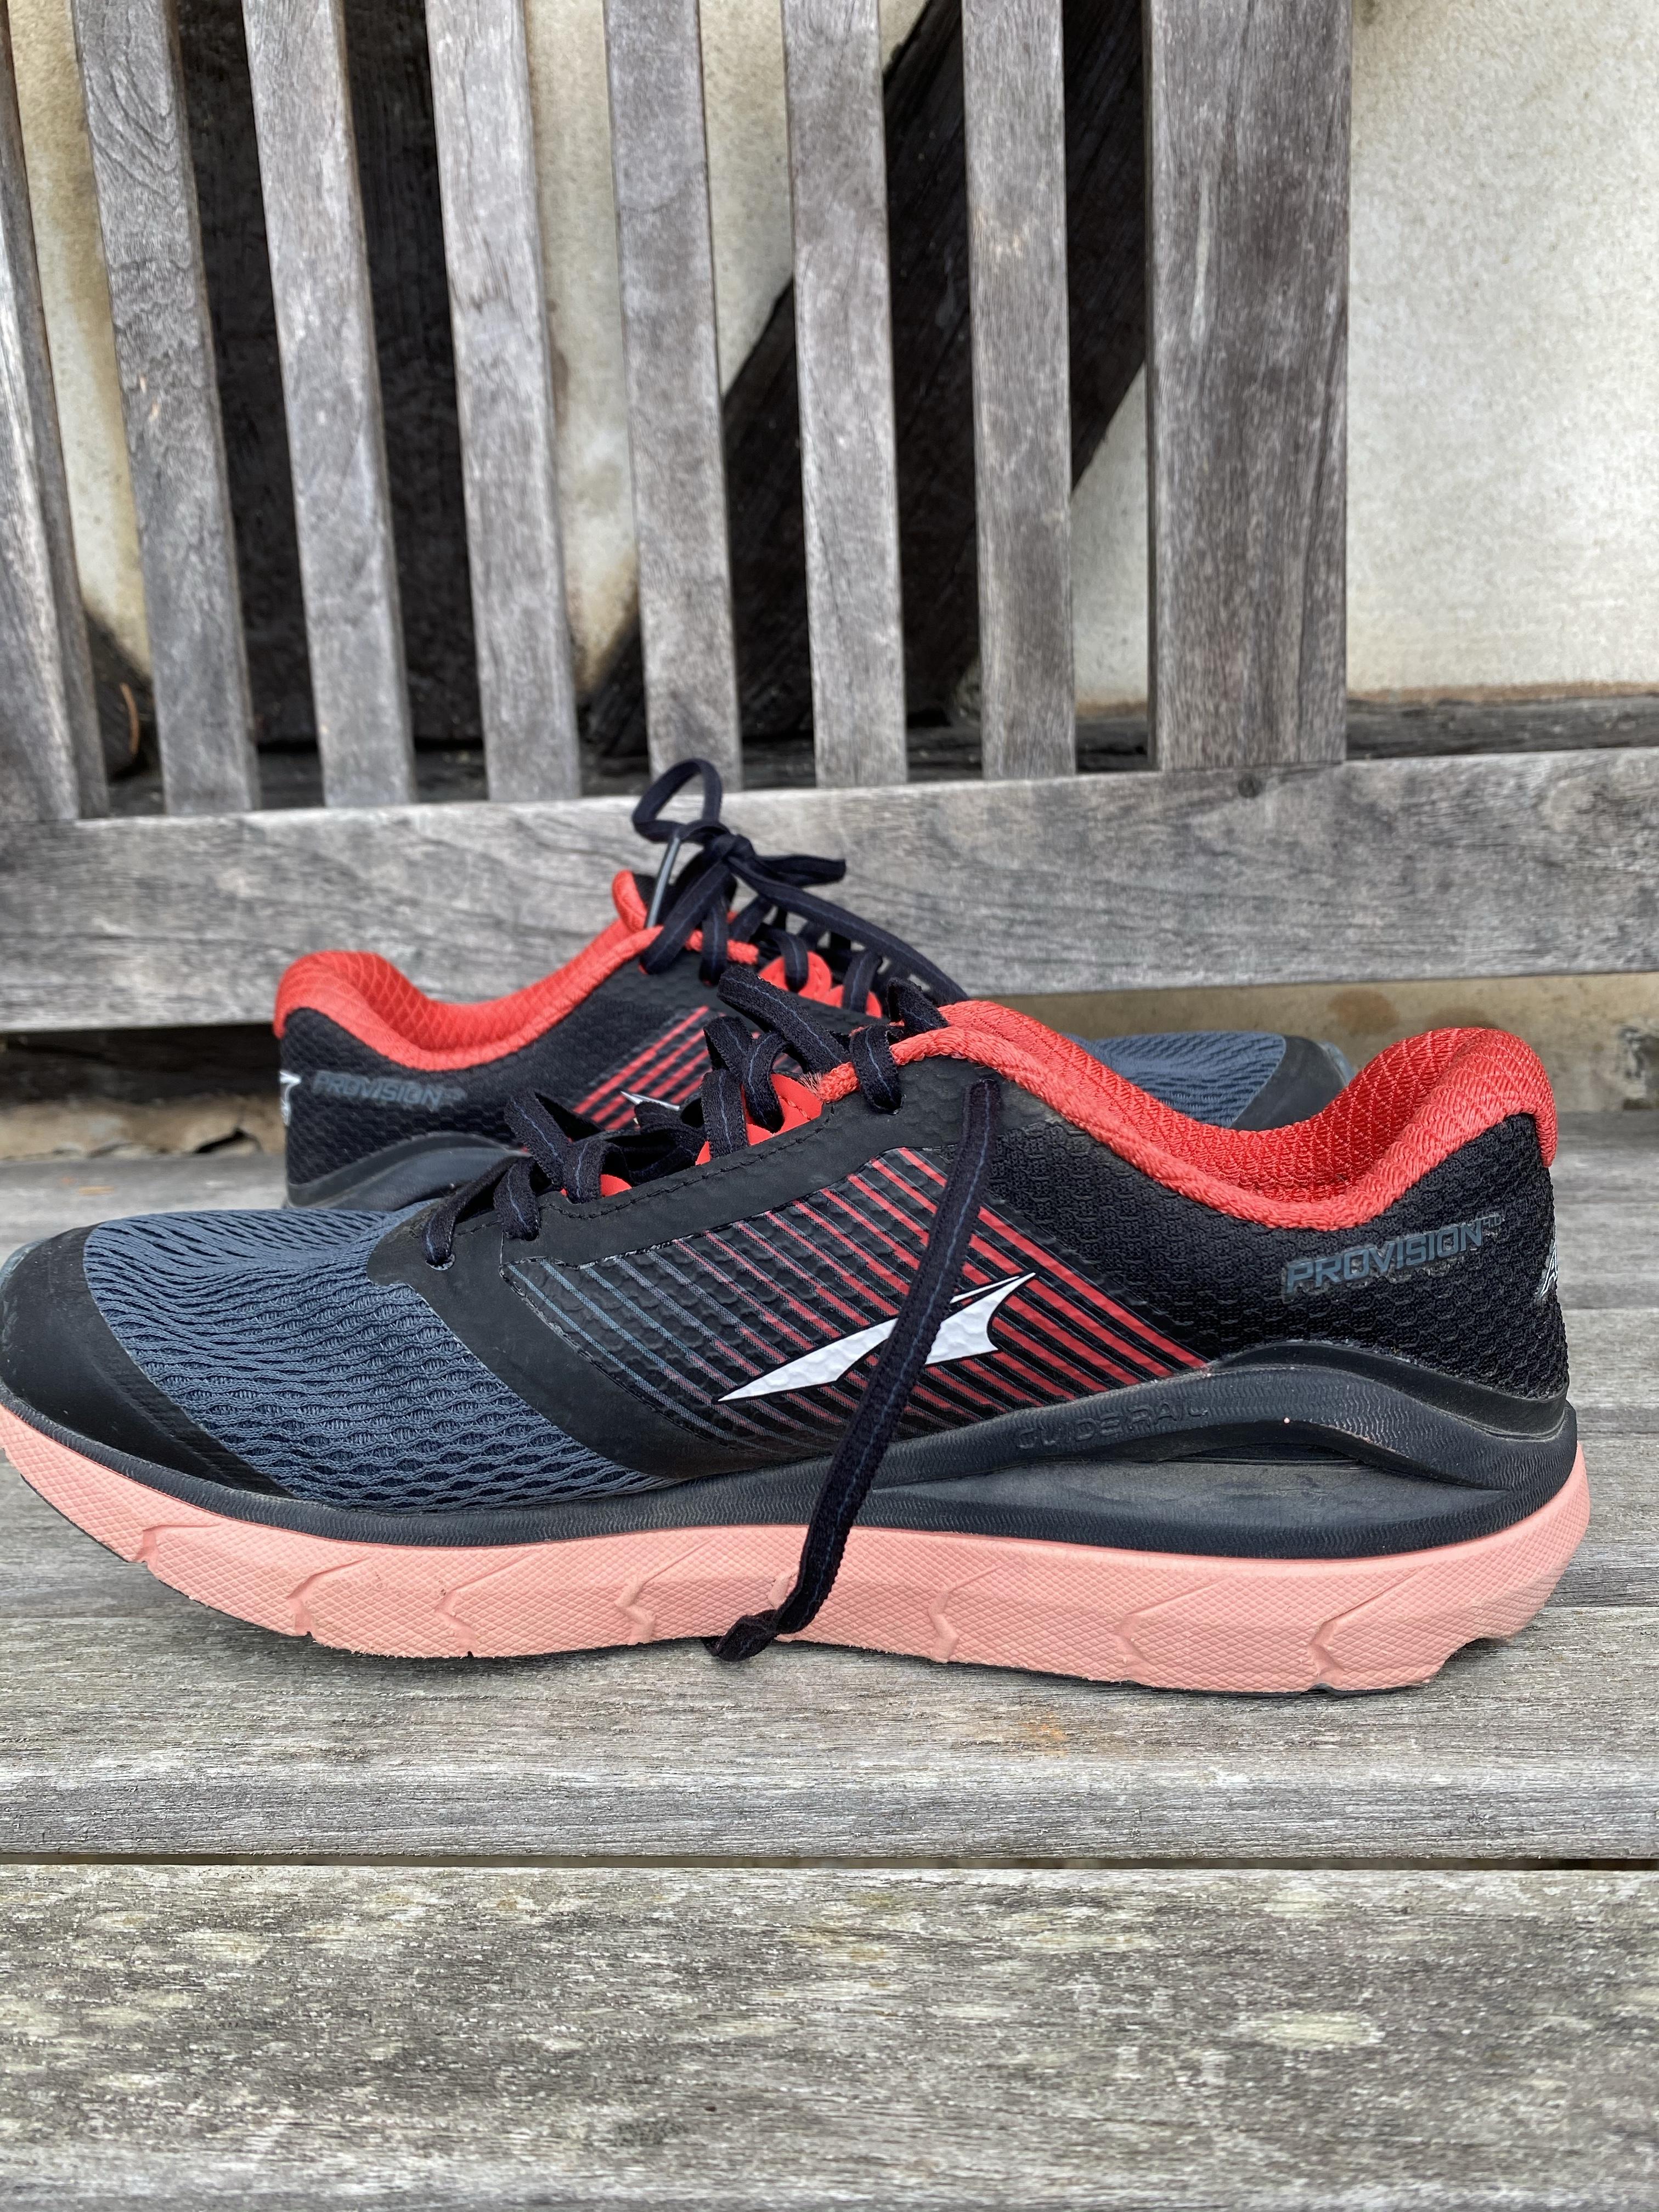 Test des chaussures running femme  Altra Provision 4